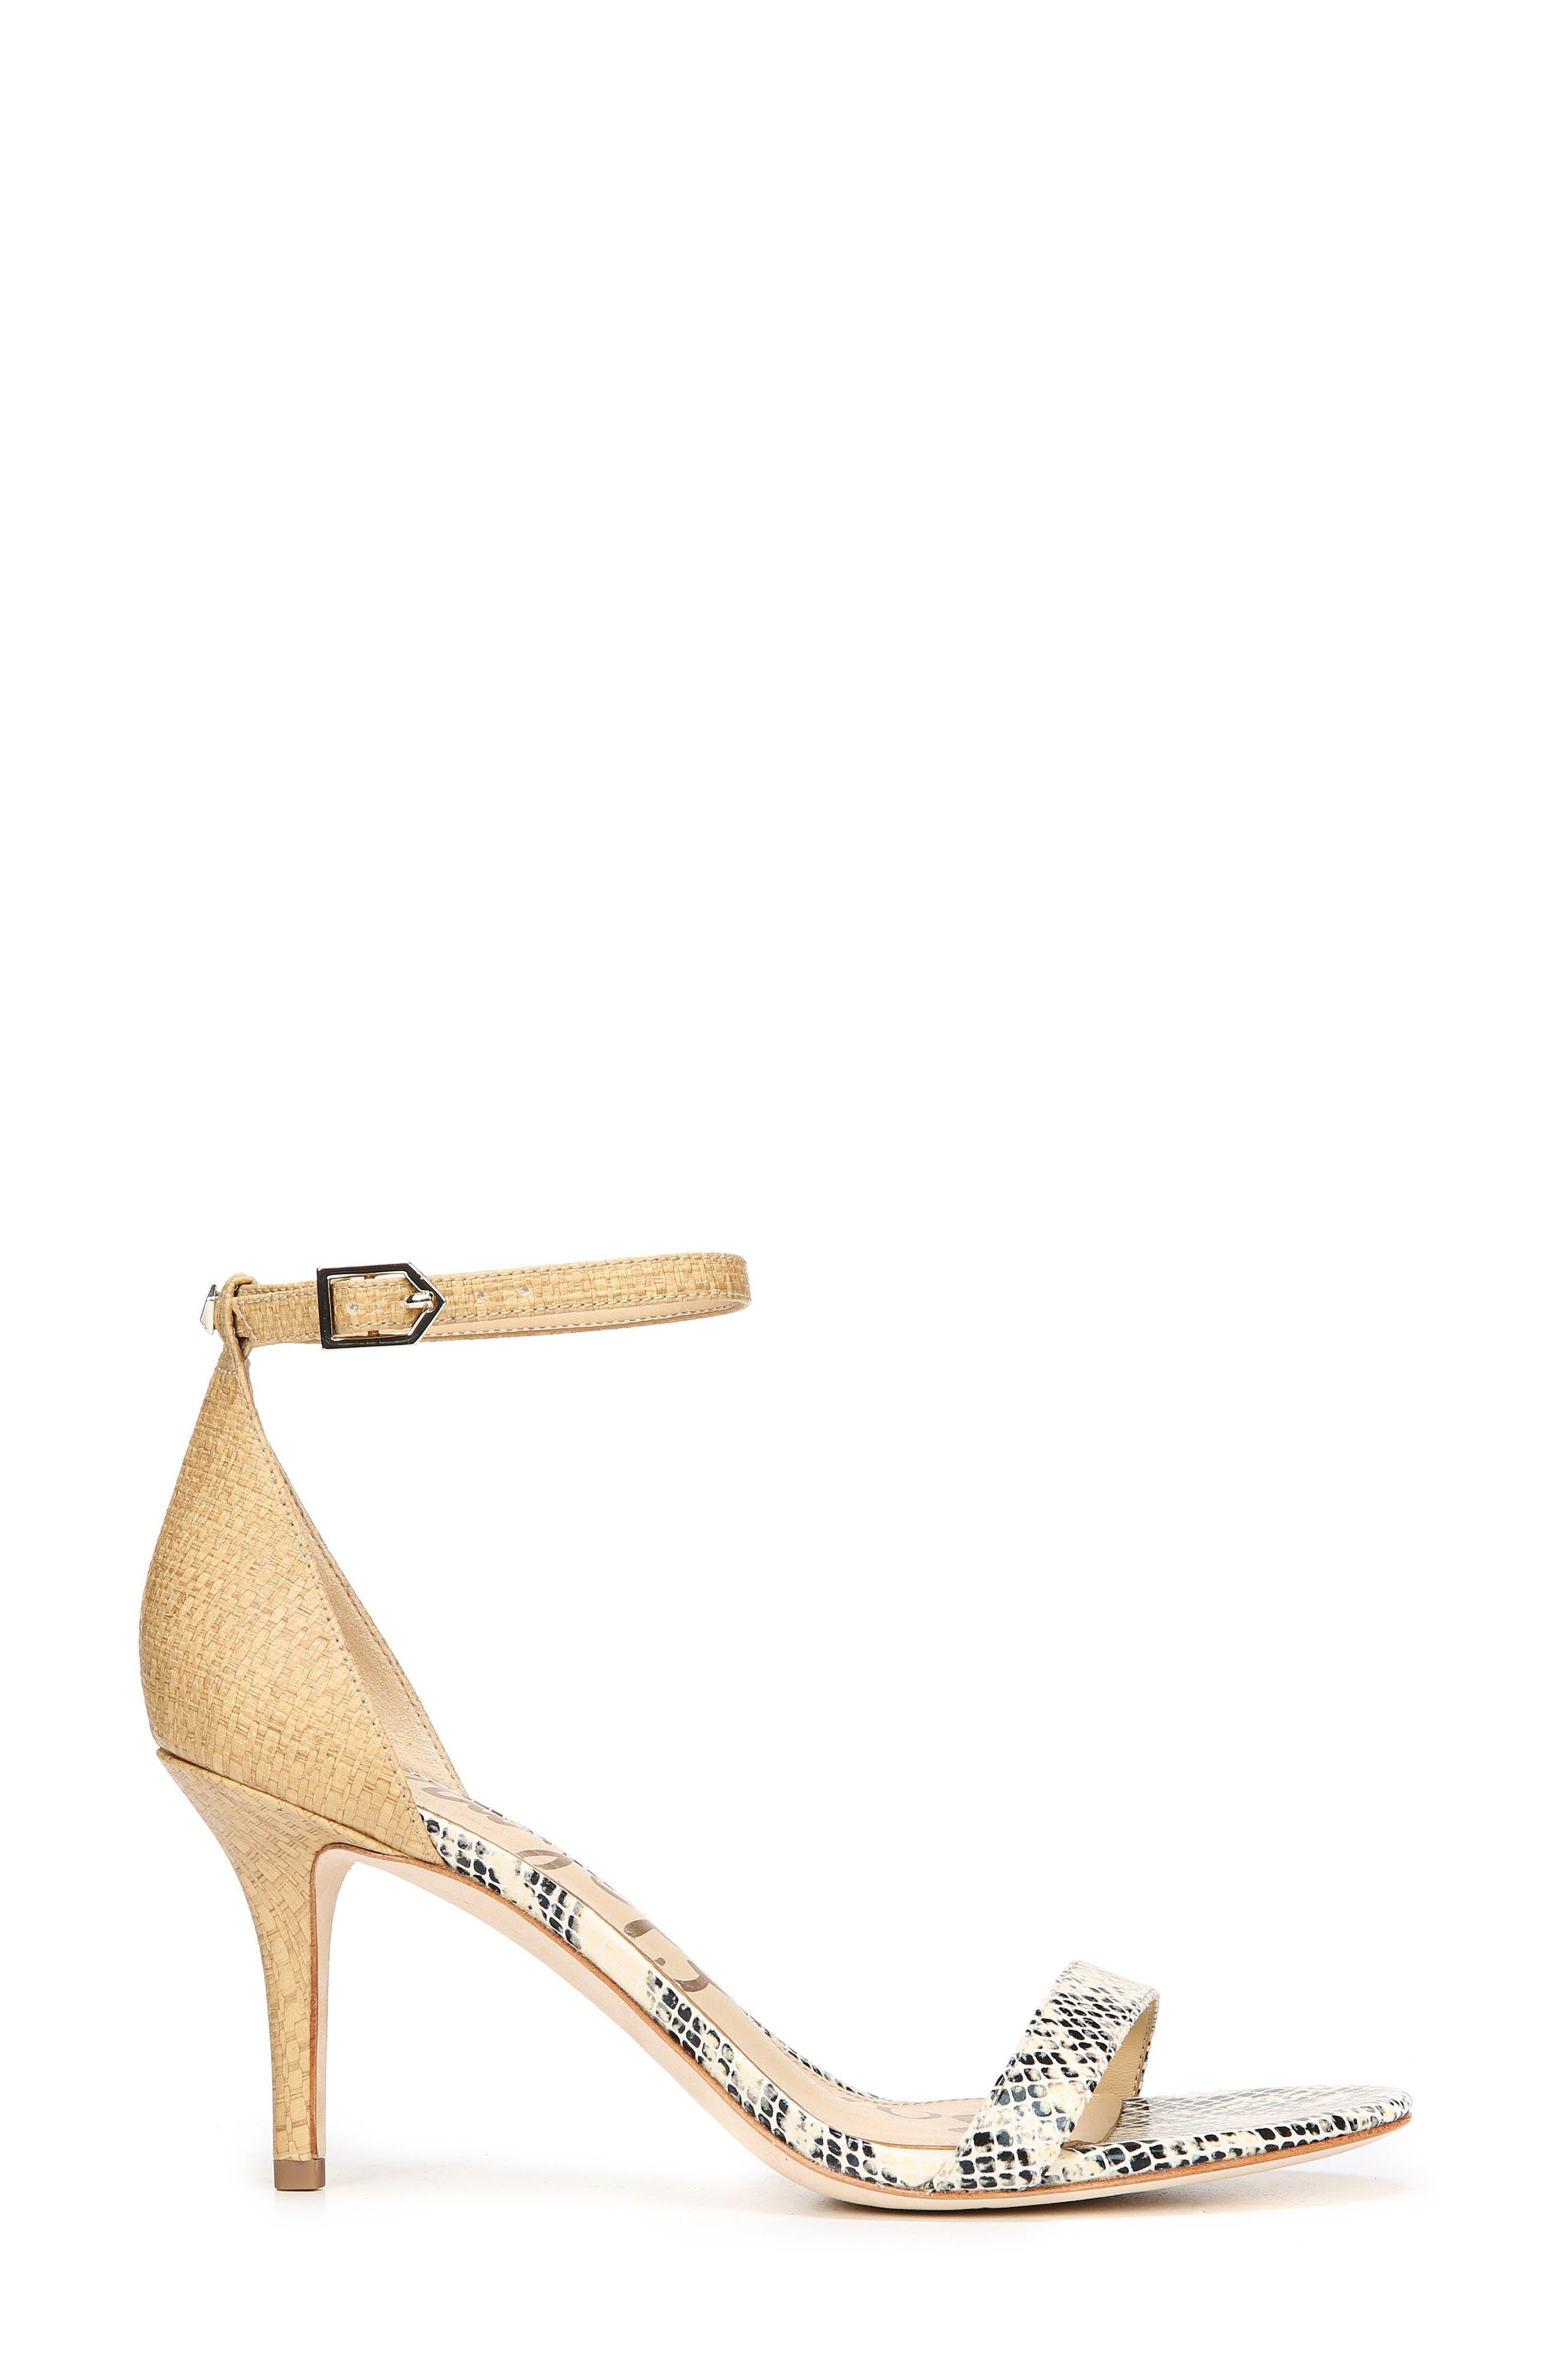 ,                             'Patti' Ankle Strap Sandal,                             Alternate thumbnail 176, color,                             250